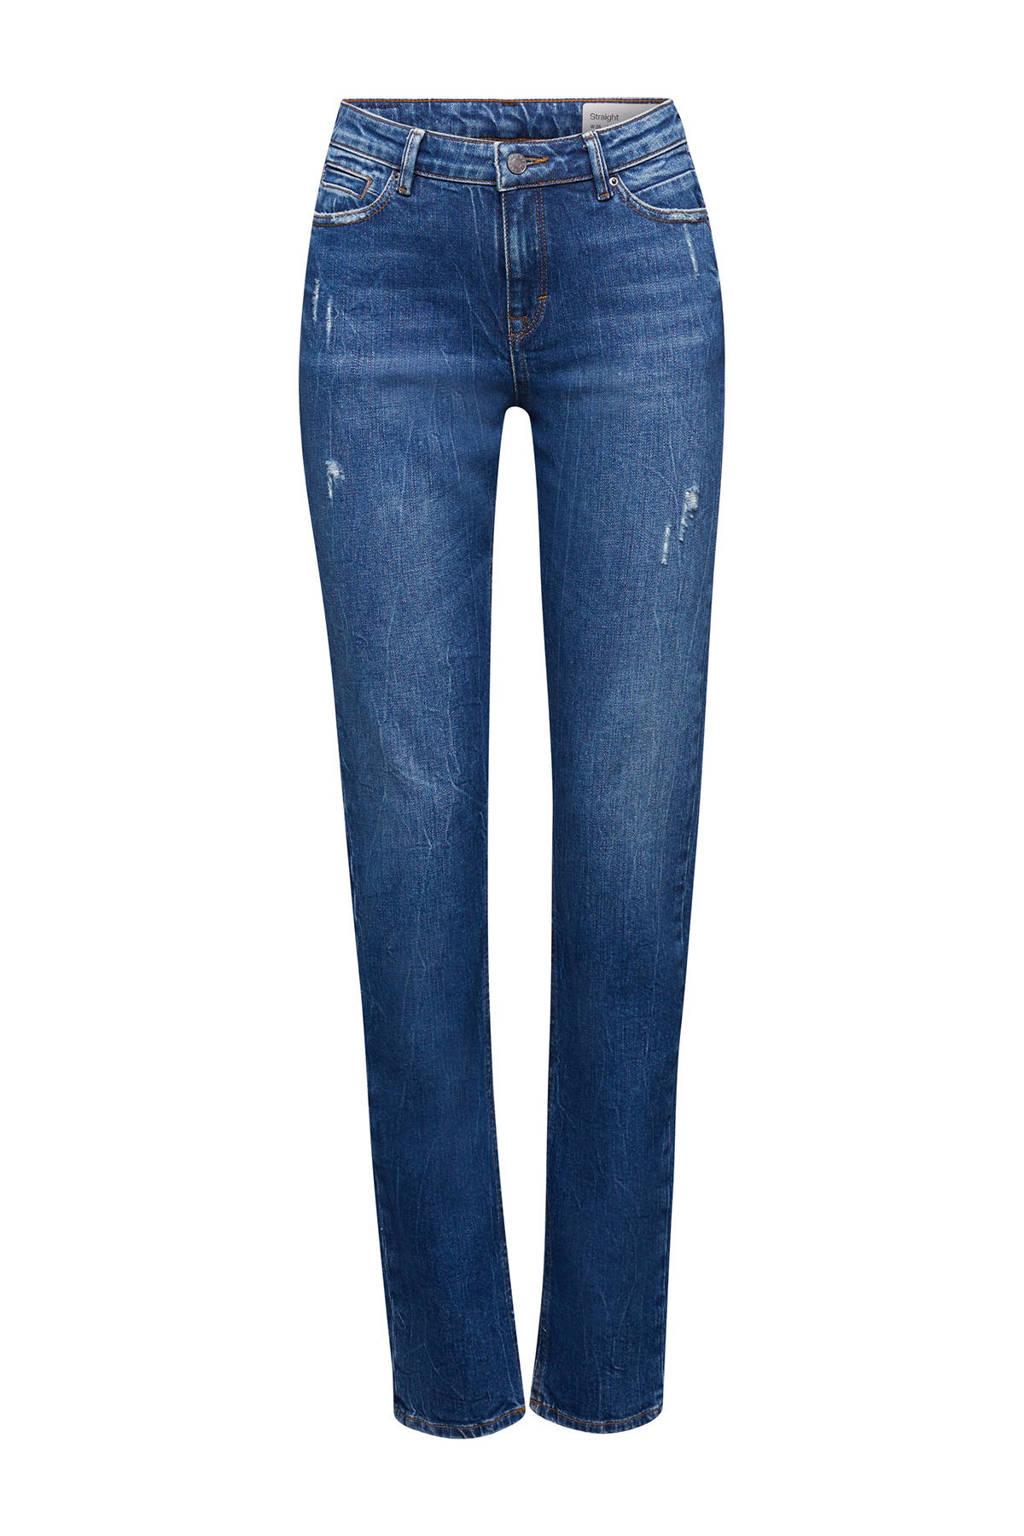 ESPRIT Women Casual straight fit jeans light denim met slijtage, Light denim